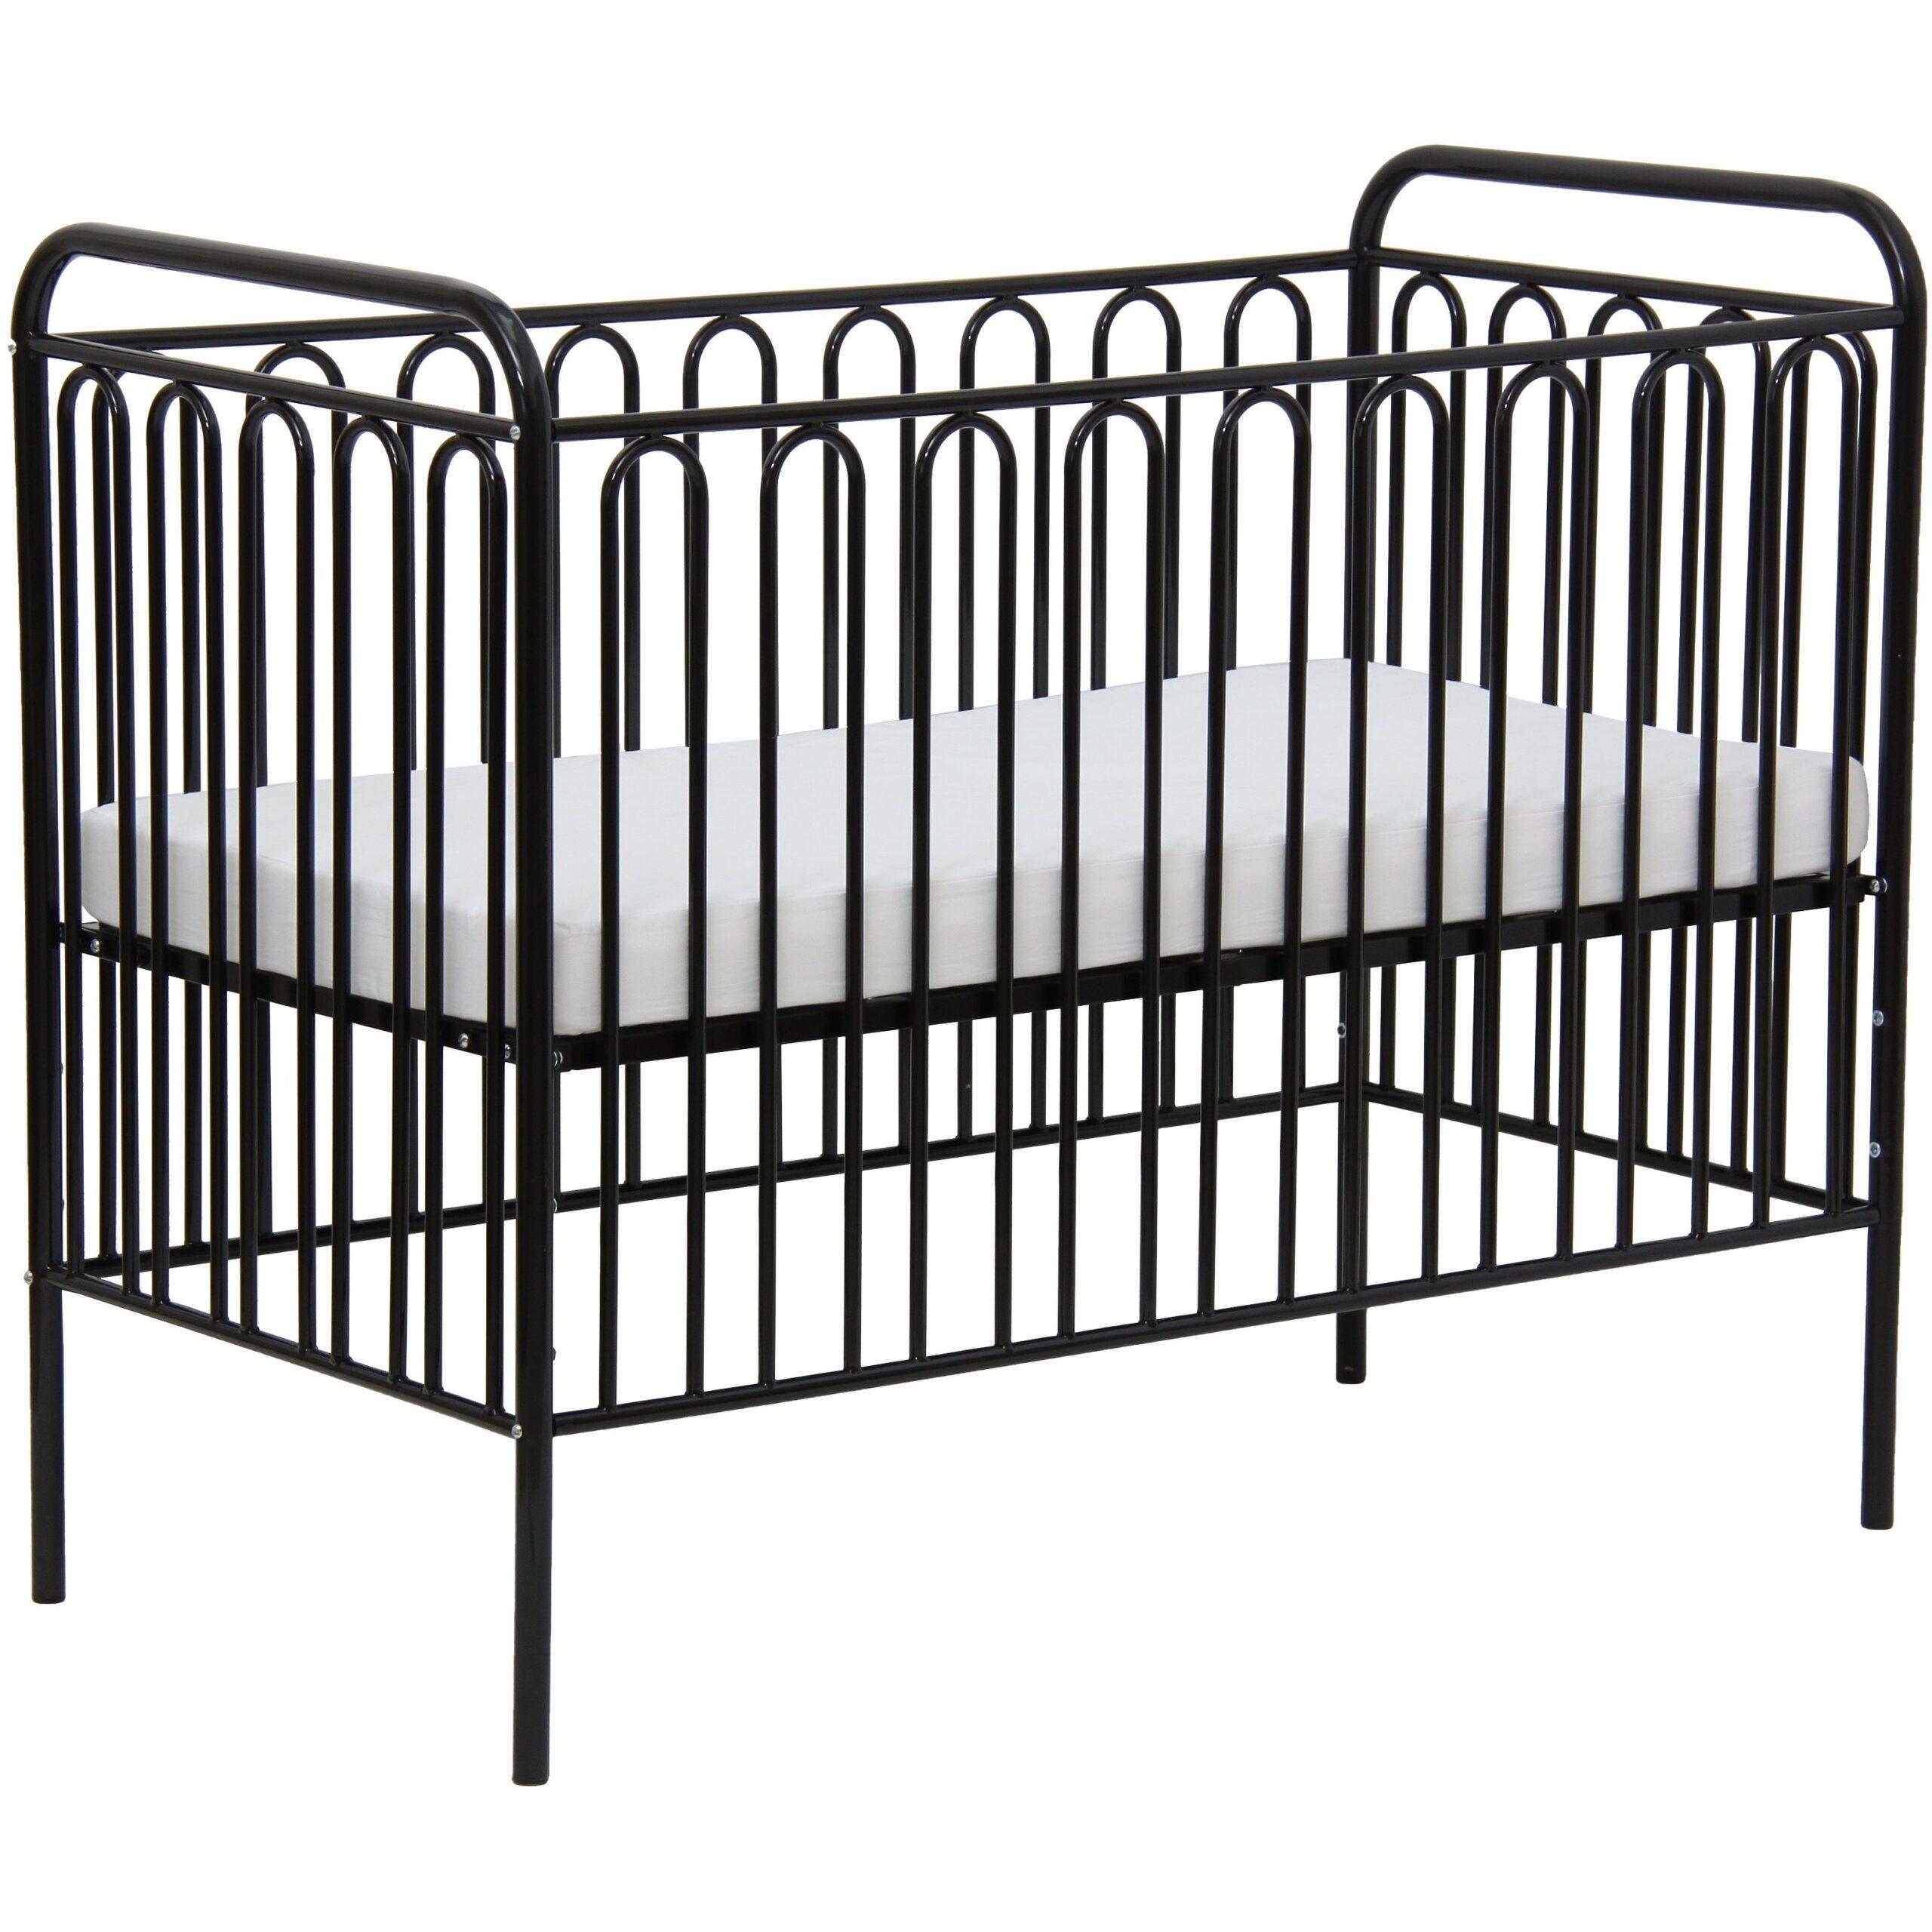 Full Size of Babybett Schwarz Kinderbett Gitterbett Aus Metall Polini 150 Schwarze Küche Bett Weiß 180x200 Schwarzes Wohnzimmer Babybett Schwarz